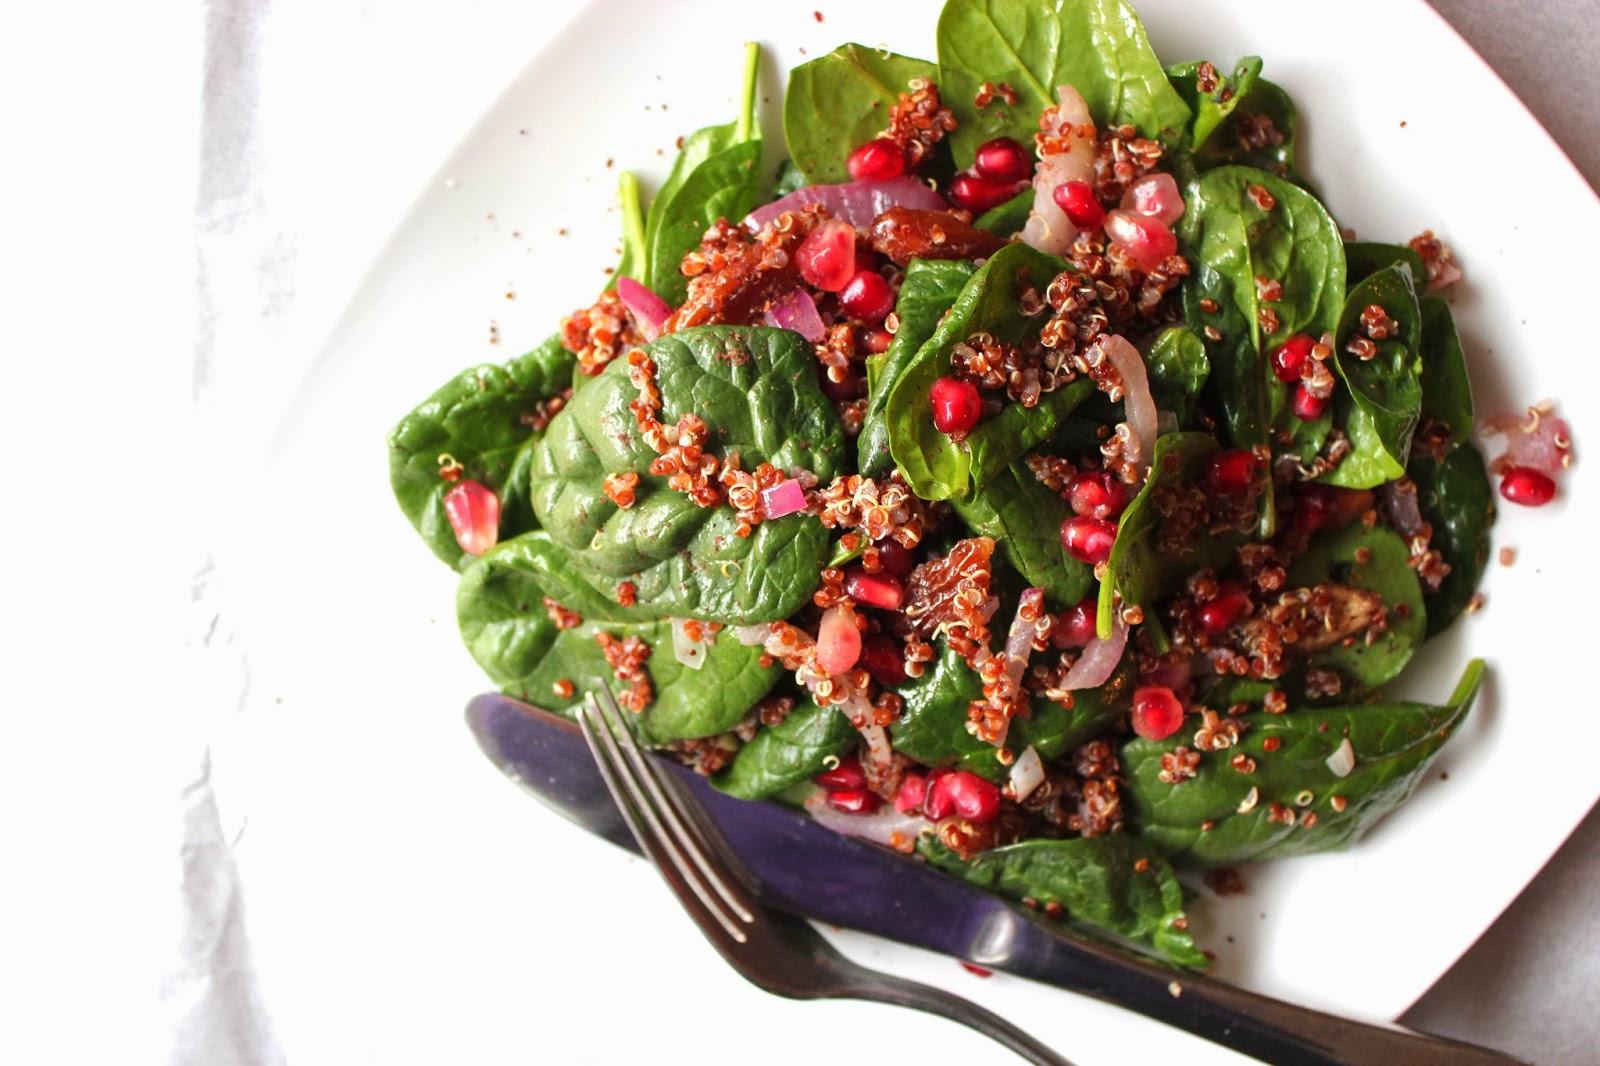 Quinoa Spinach Salad  Swirl & Scramble Baby Spinach Quinoa Salad with Dates & Sumac